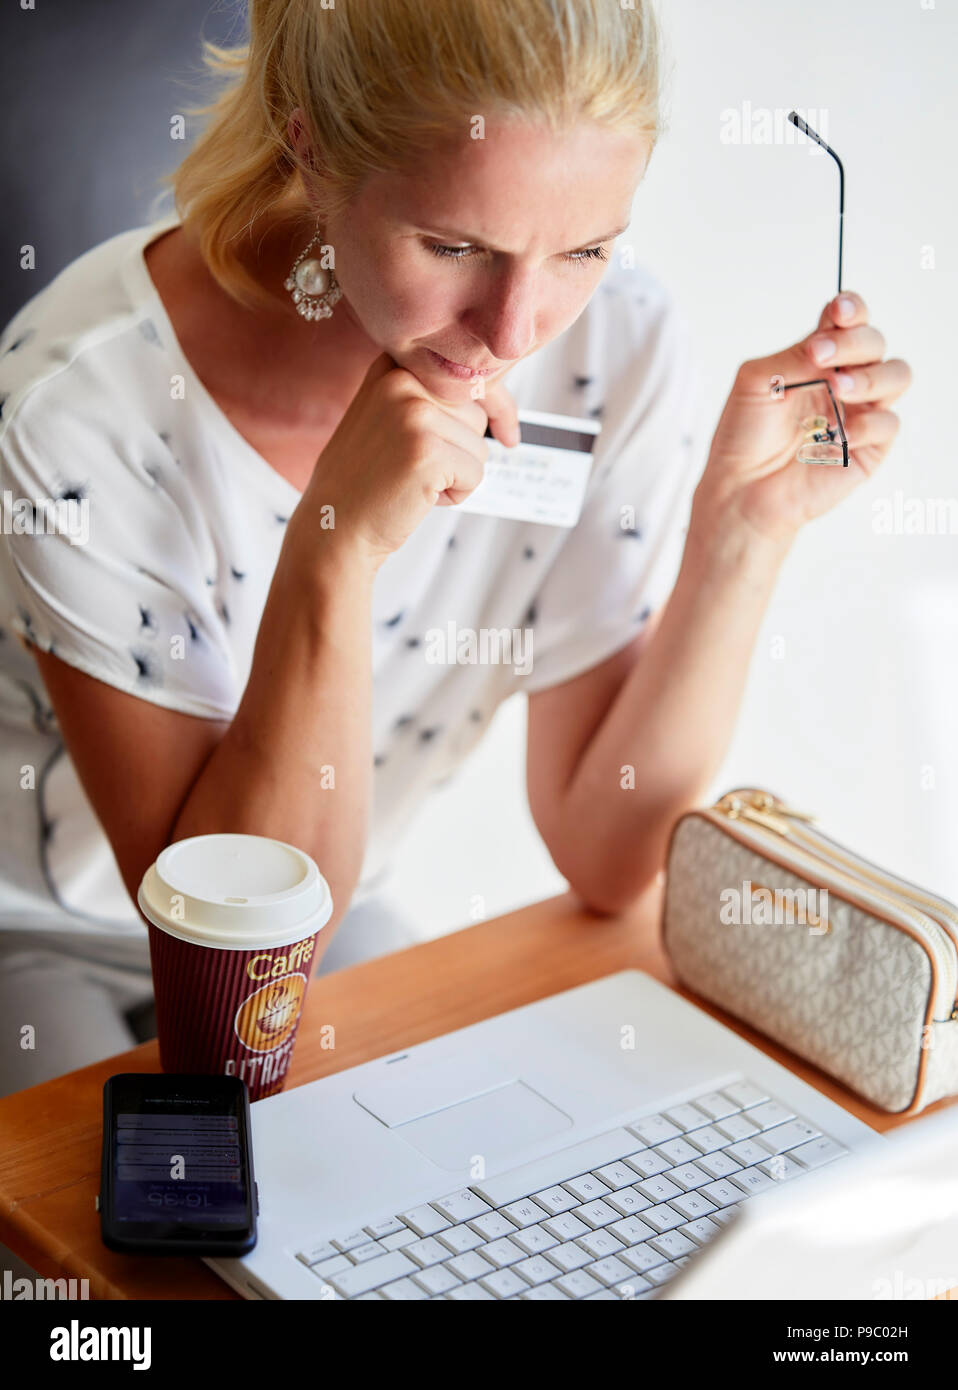 Woman using laptop online - Stock Image